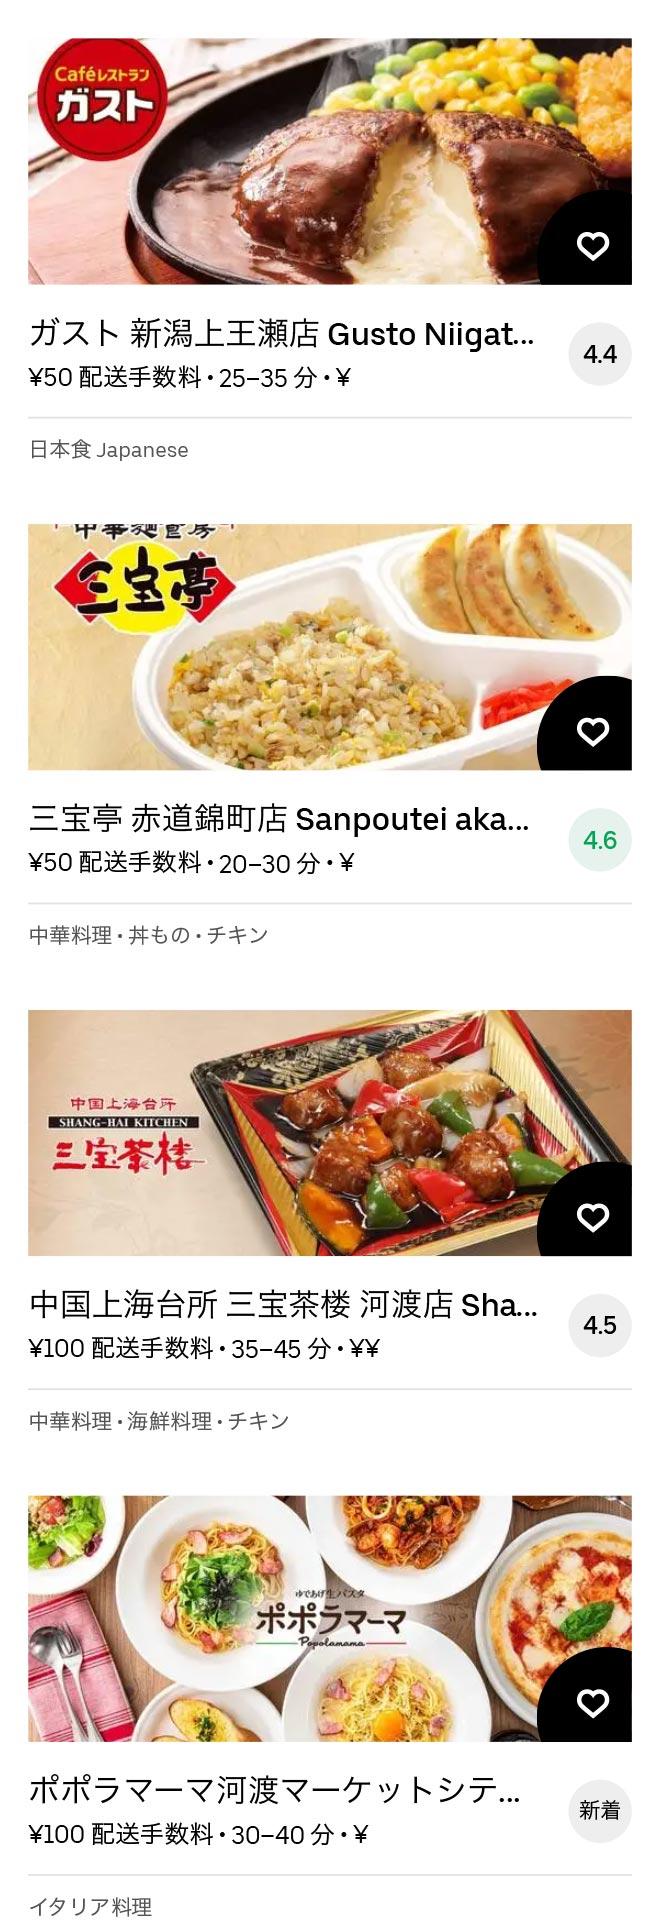 Koganemachi menu 2011 03